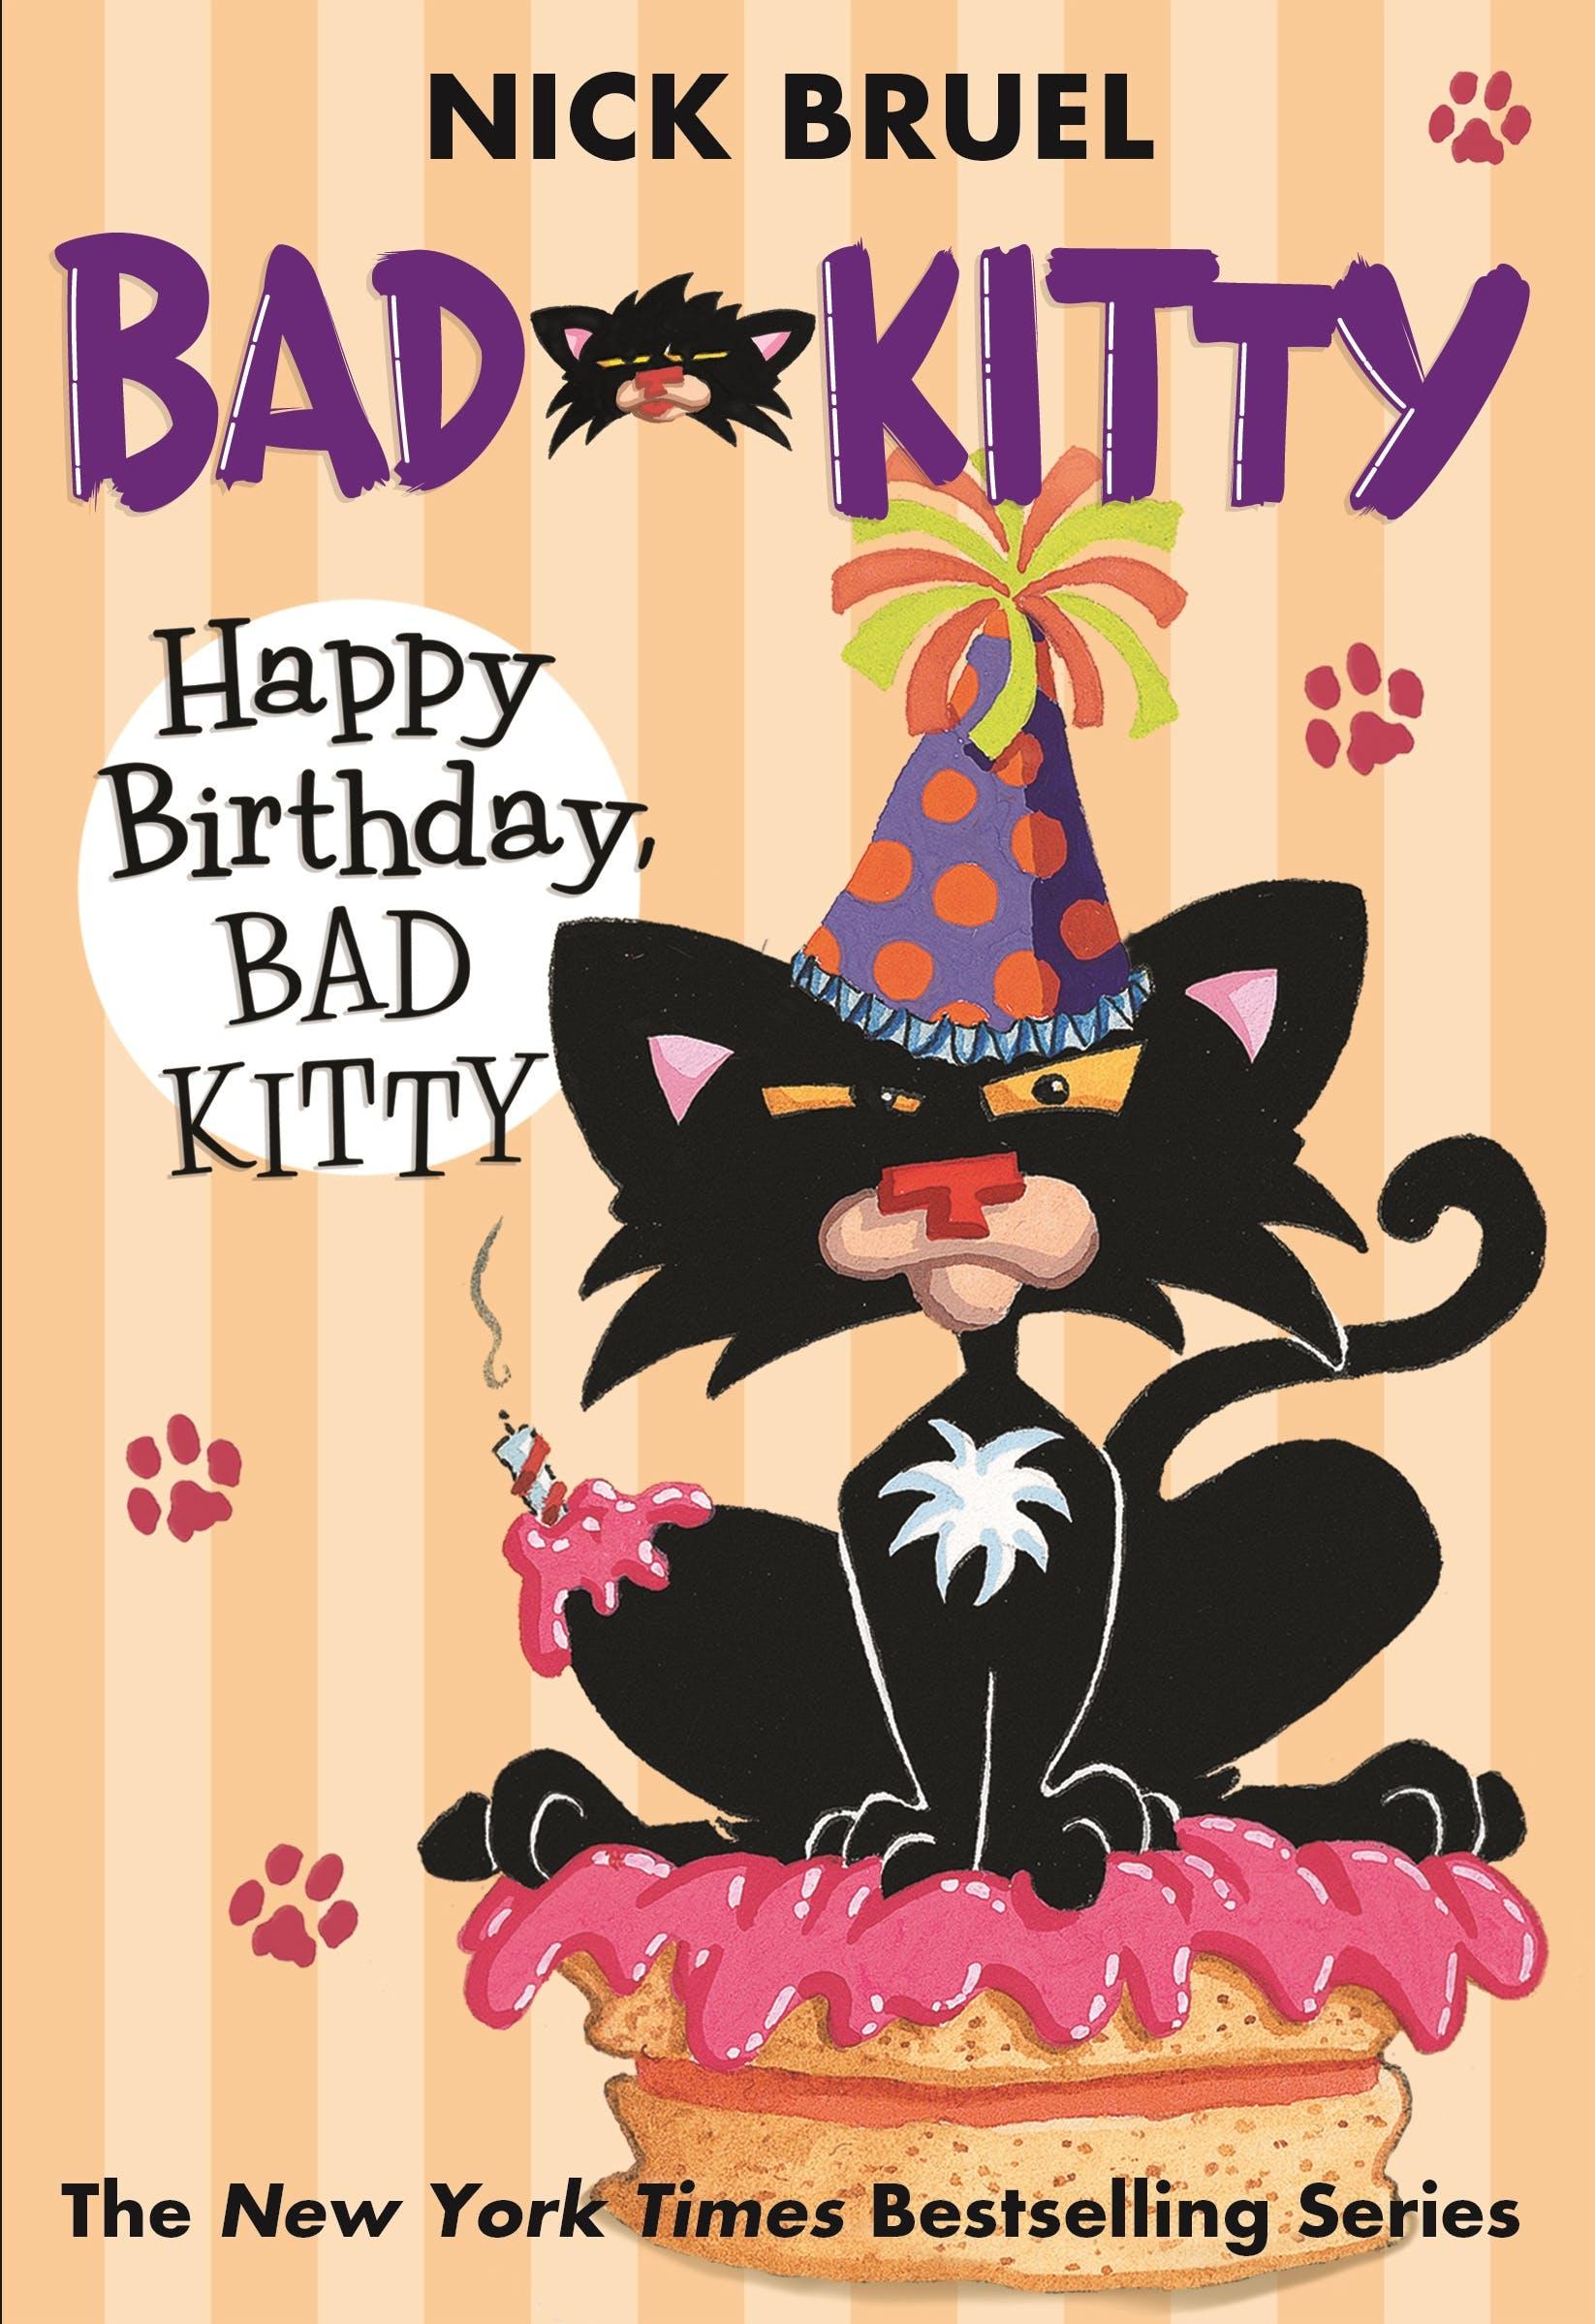 Image of Happy Birthday, Bad Kitty